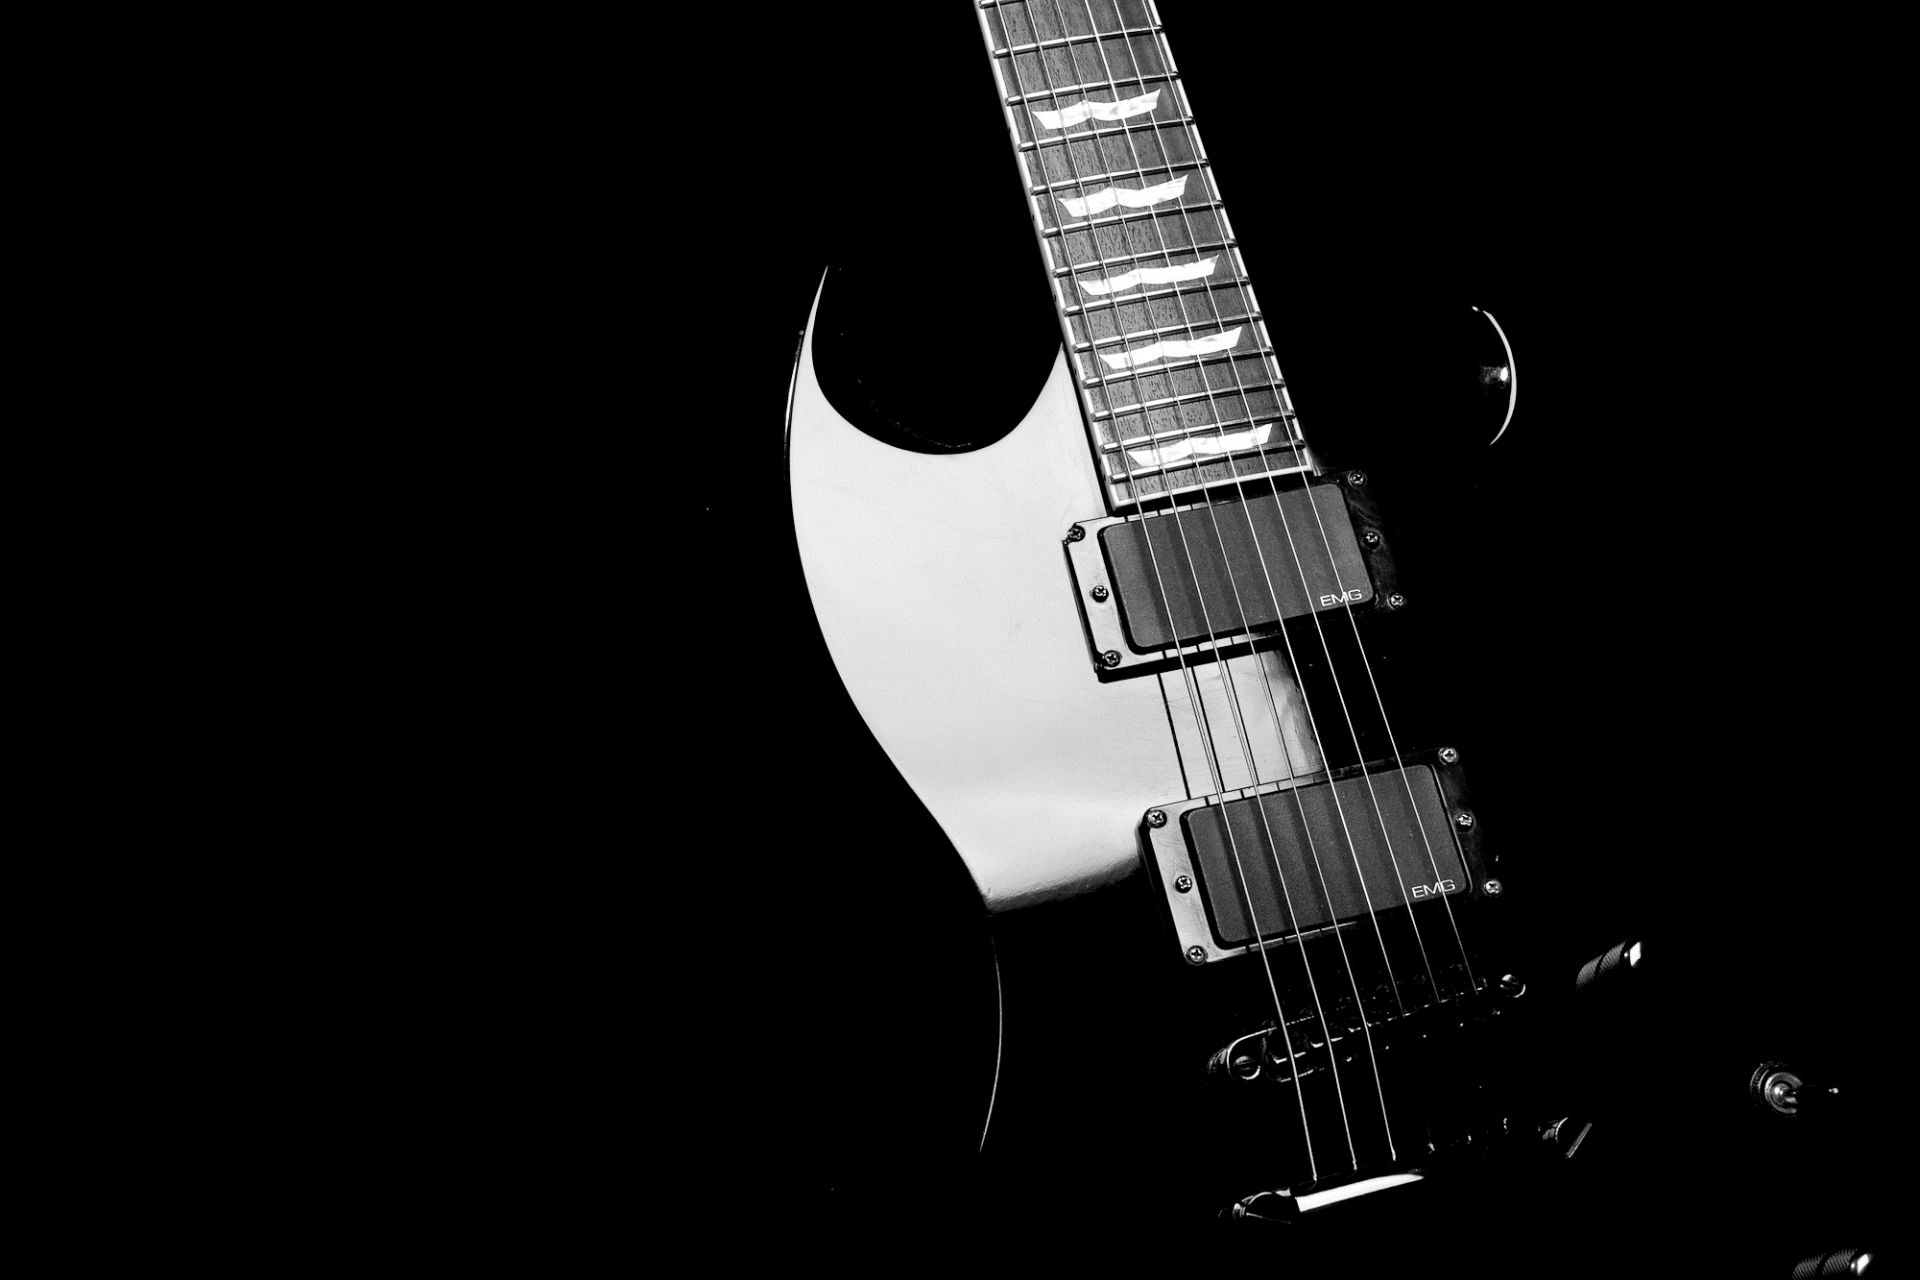 Electric Guitar black, PC Wallpaper